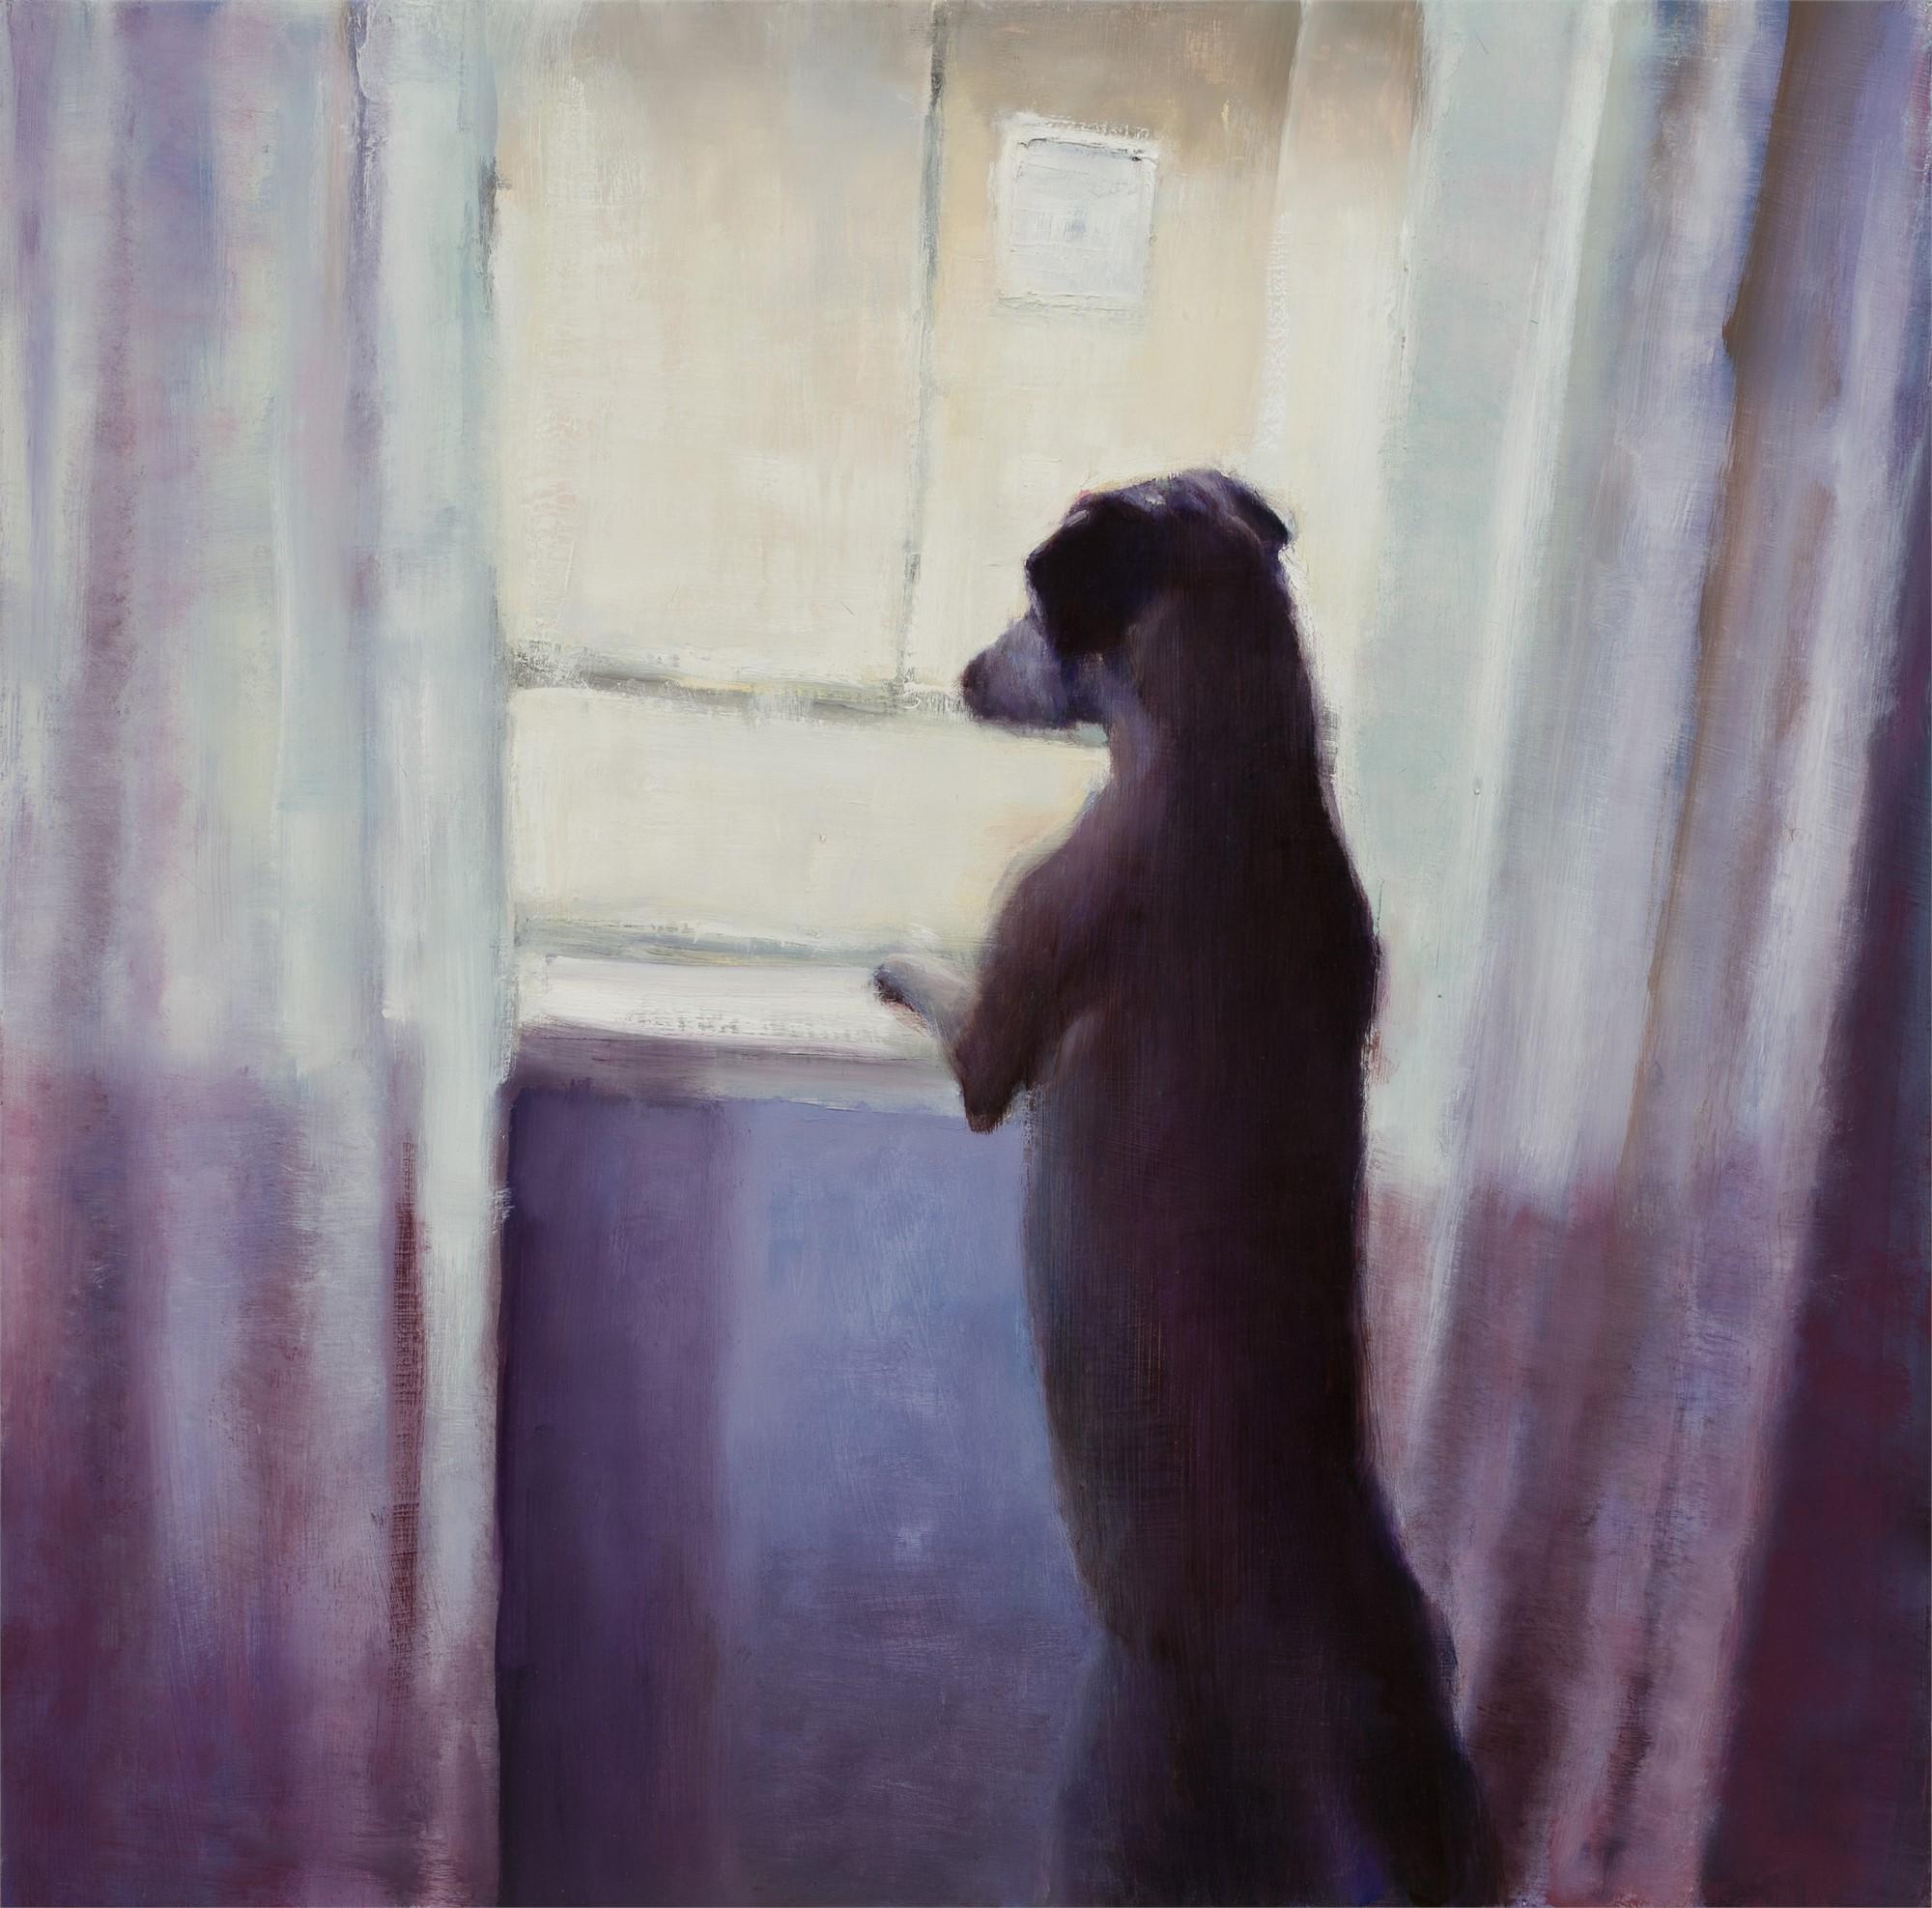 Window Shopping by Elsa Sroka